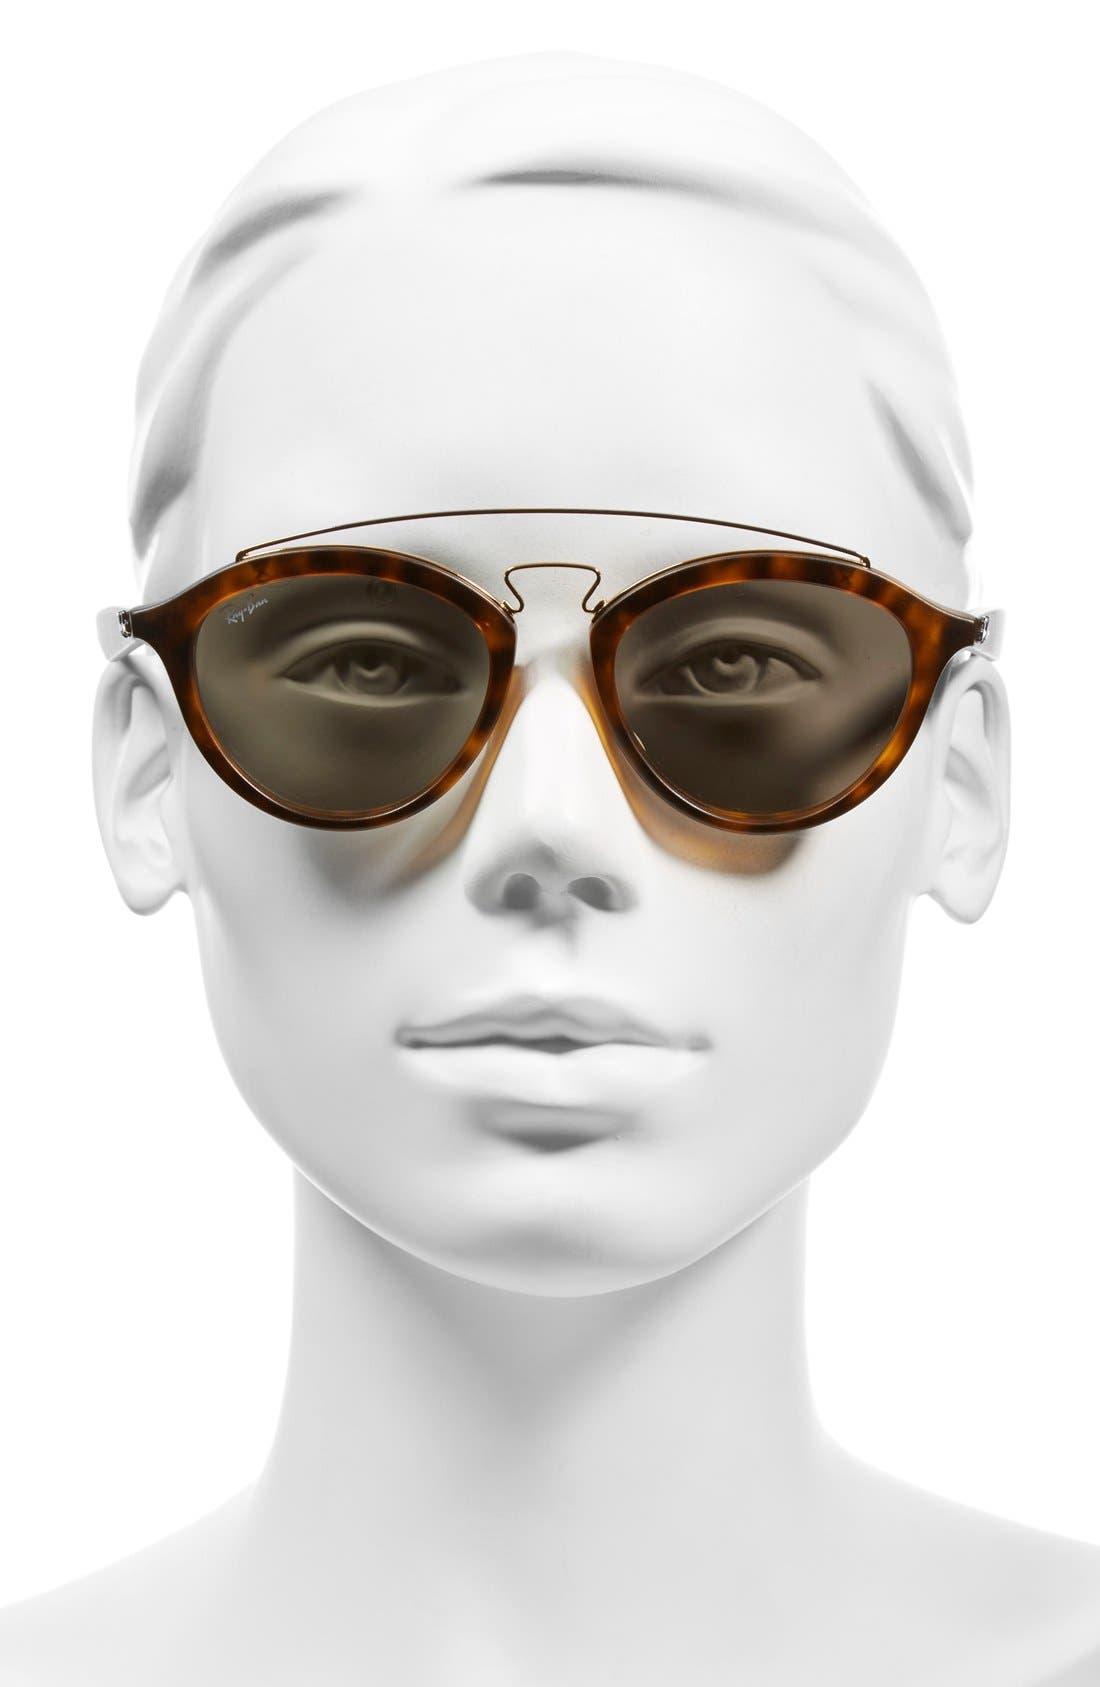 Highstreet 50mm Brow Bar Sunglasses,                             Alternate thumbnail 11, color,